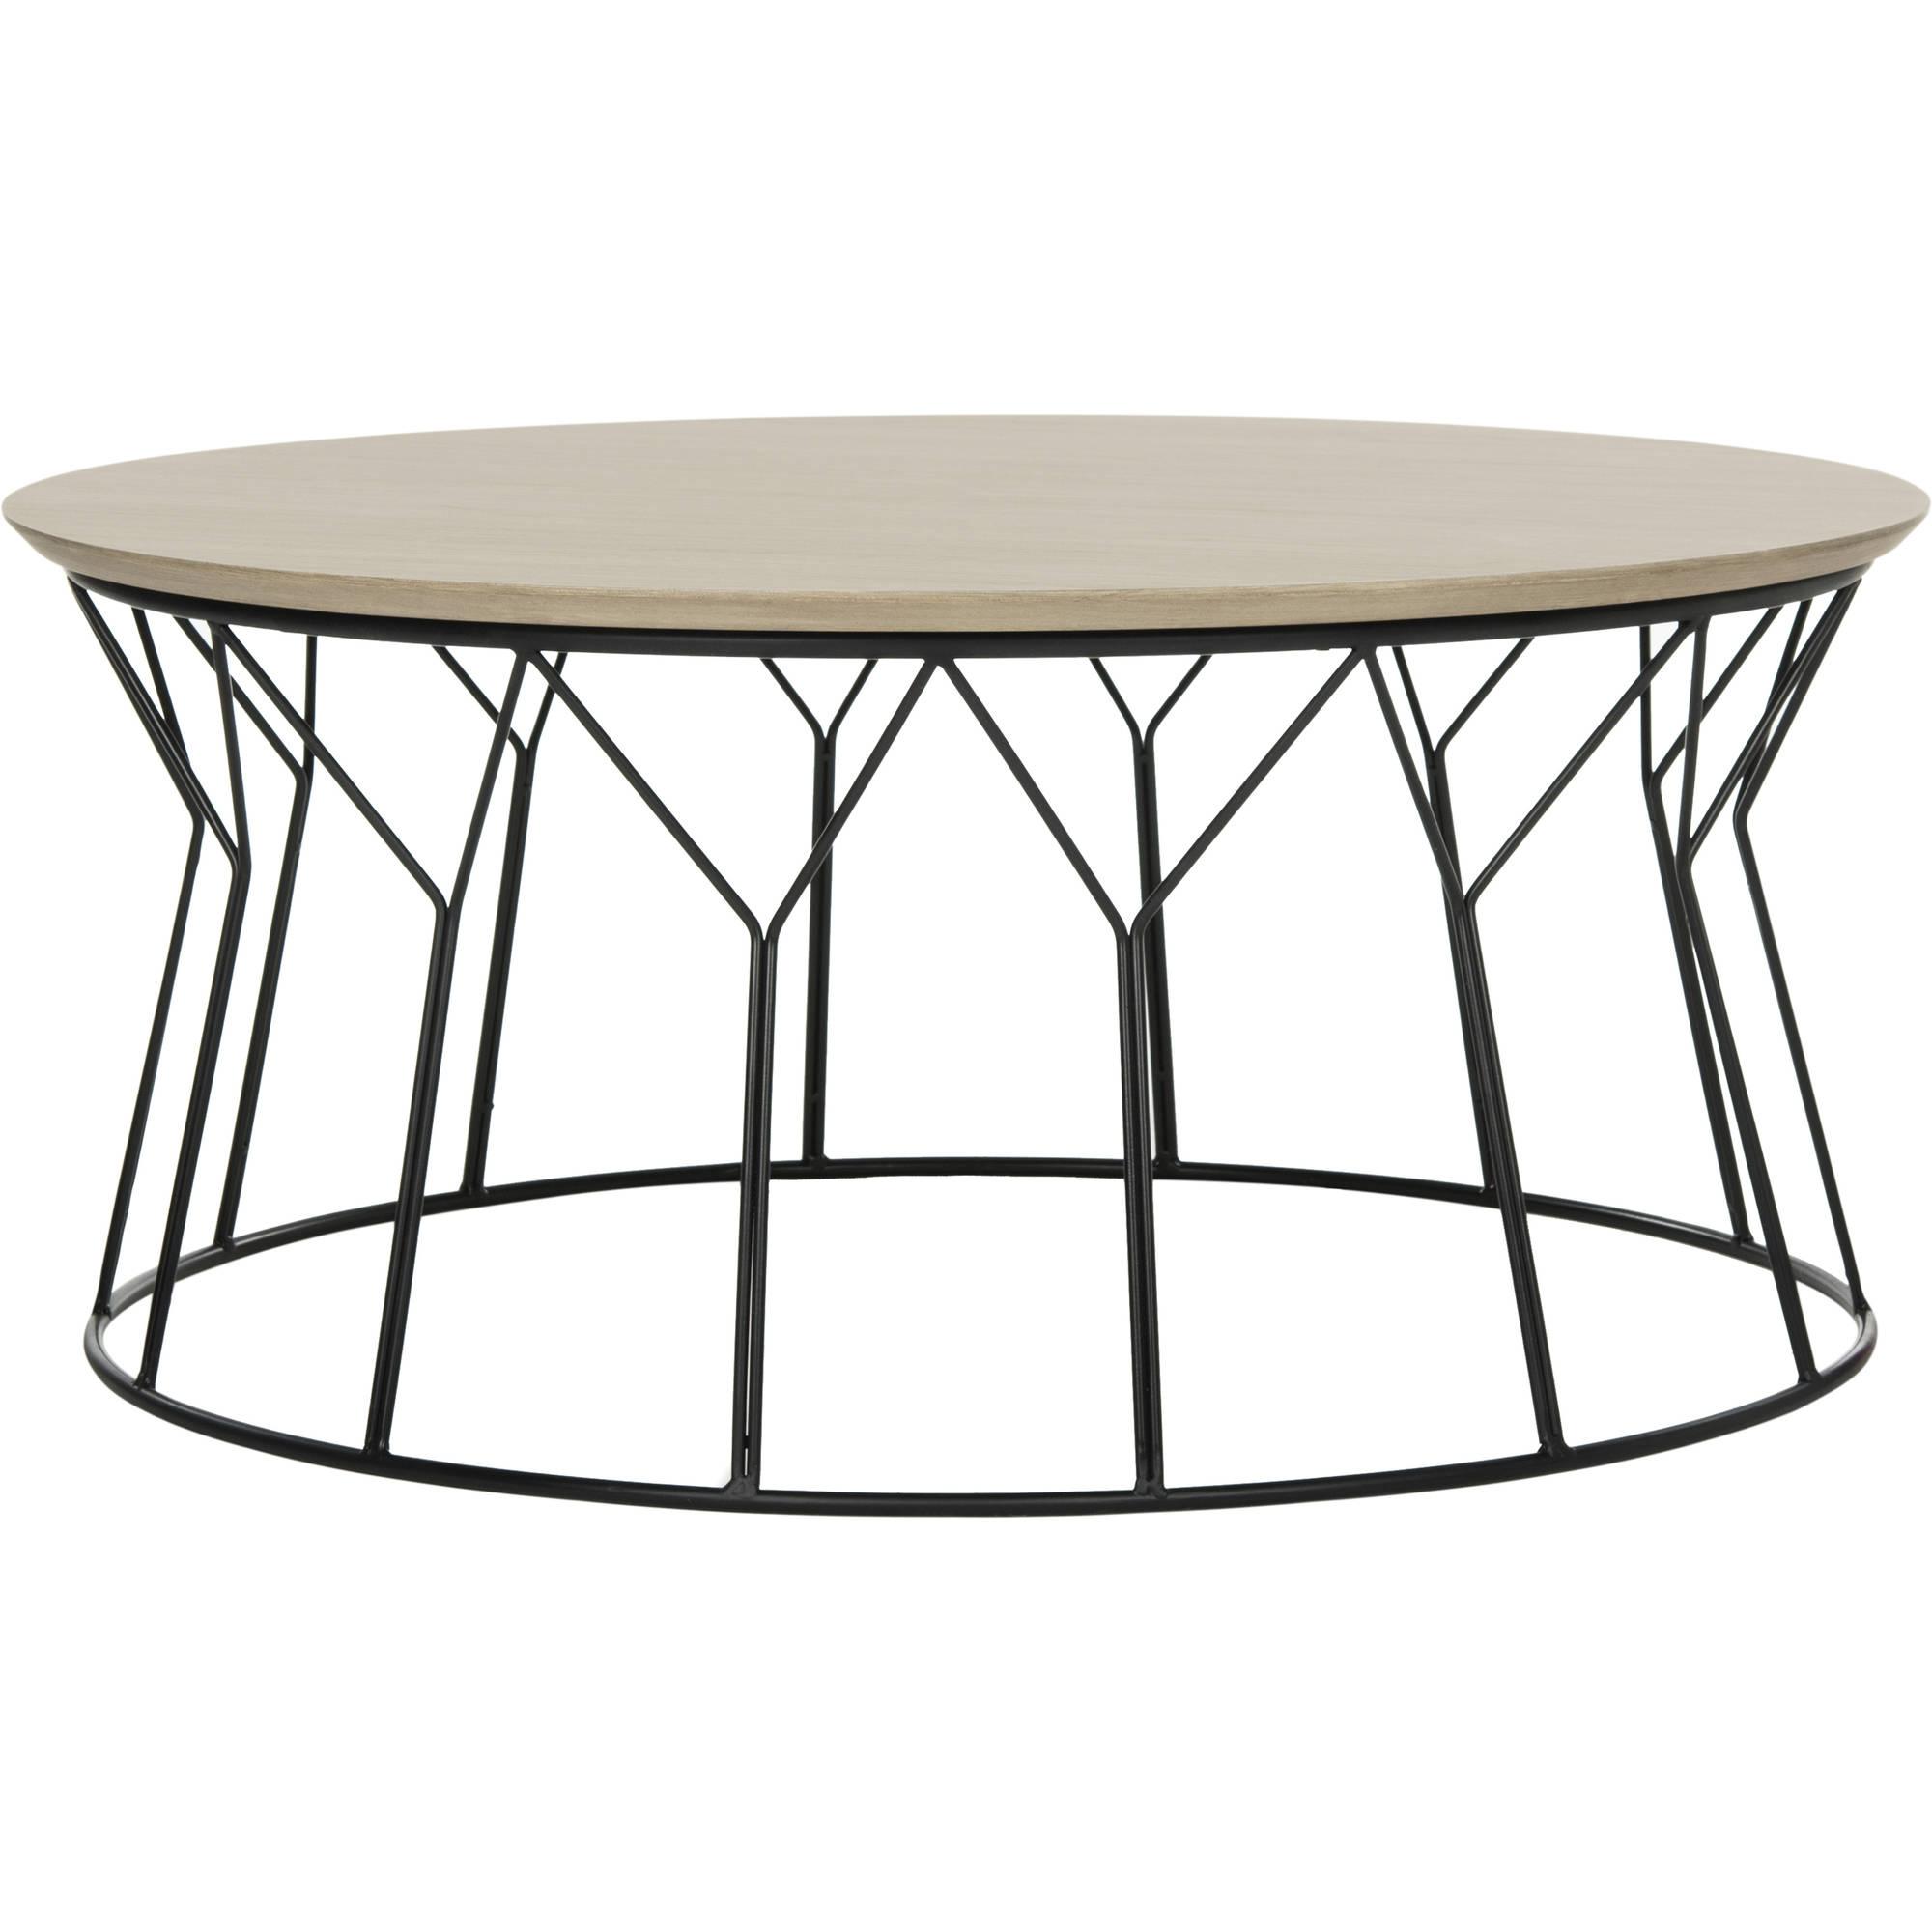 "Safavieh Deion 35"" Round Retro Mid Century Coffee Table, Multiple Colors"